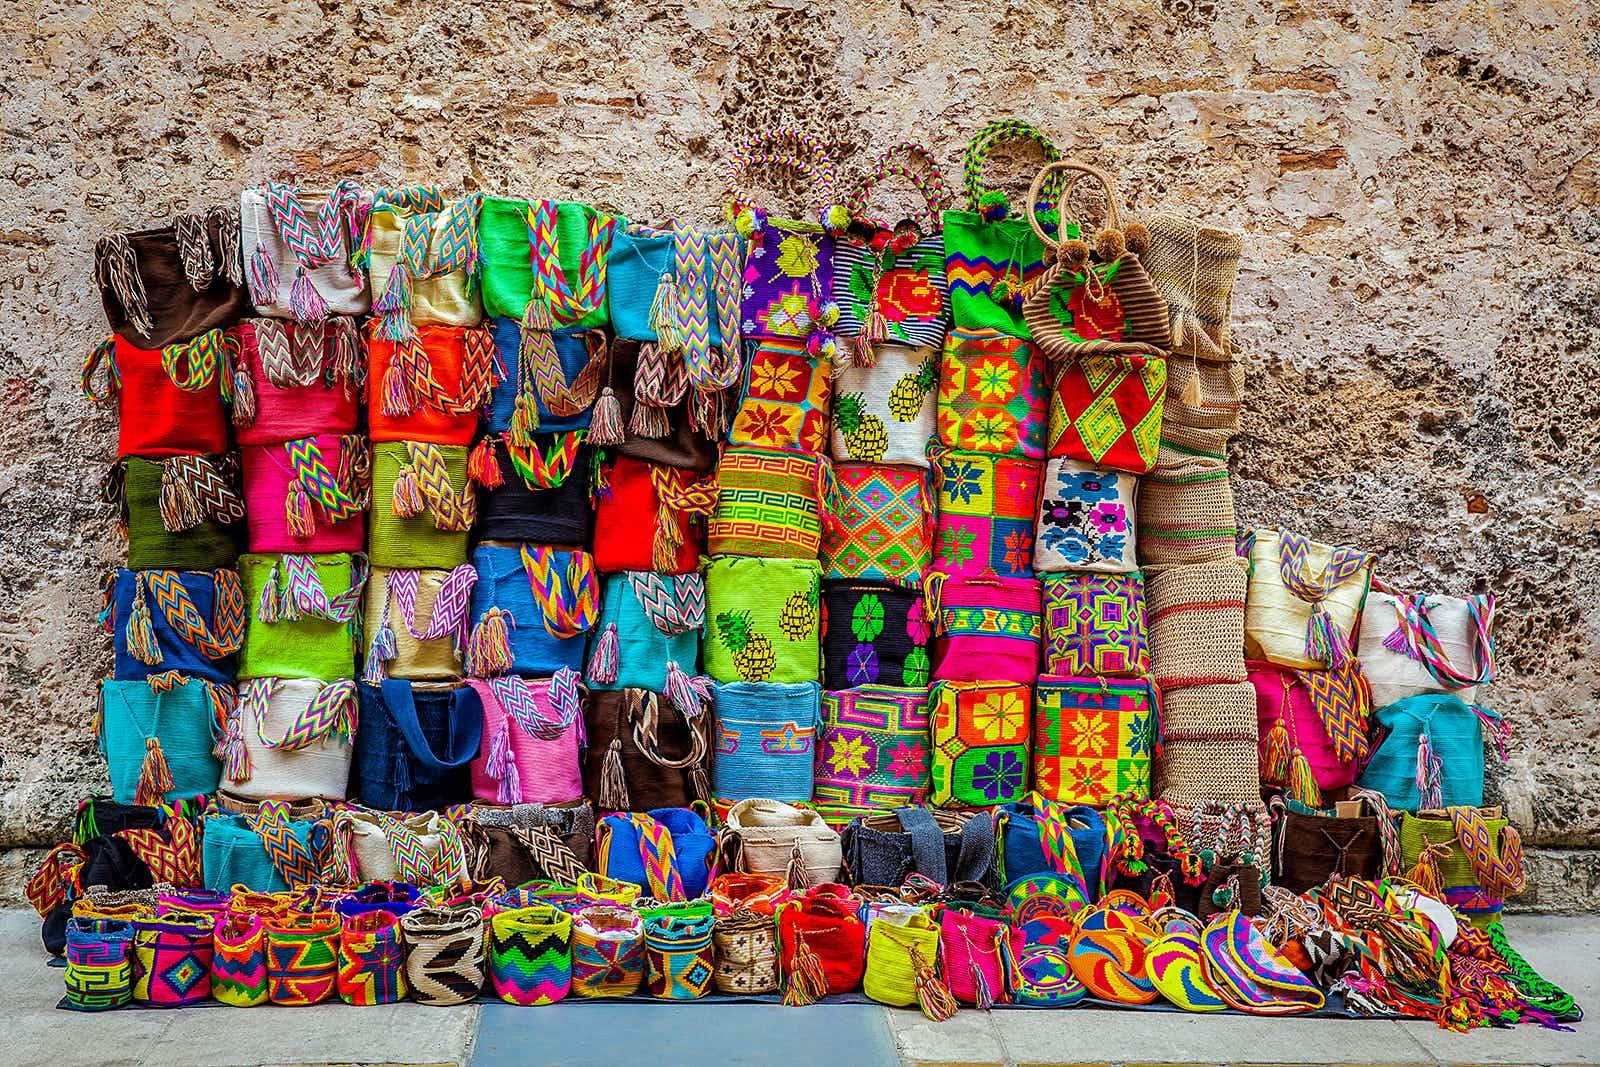 The Wayúu of La Guajira have a long weaving tradition ©Anamejia18 / Getty Images